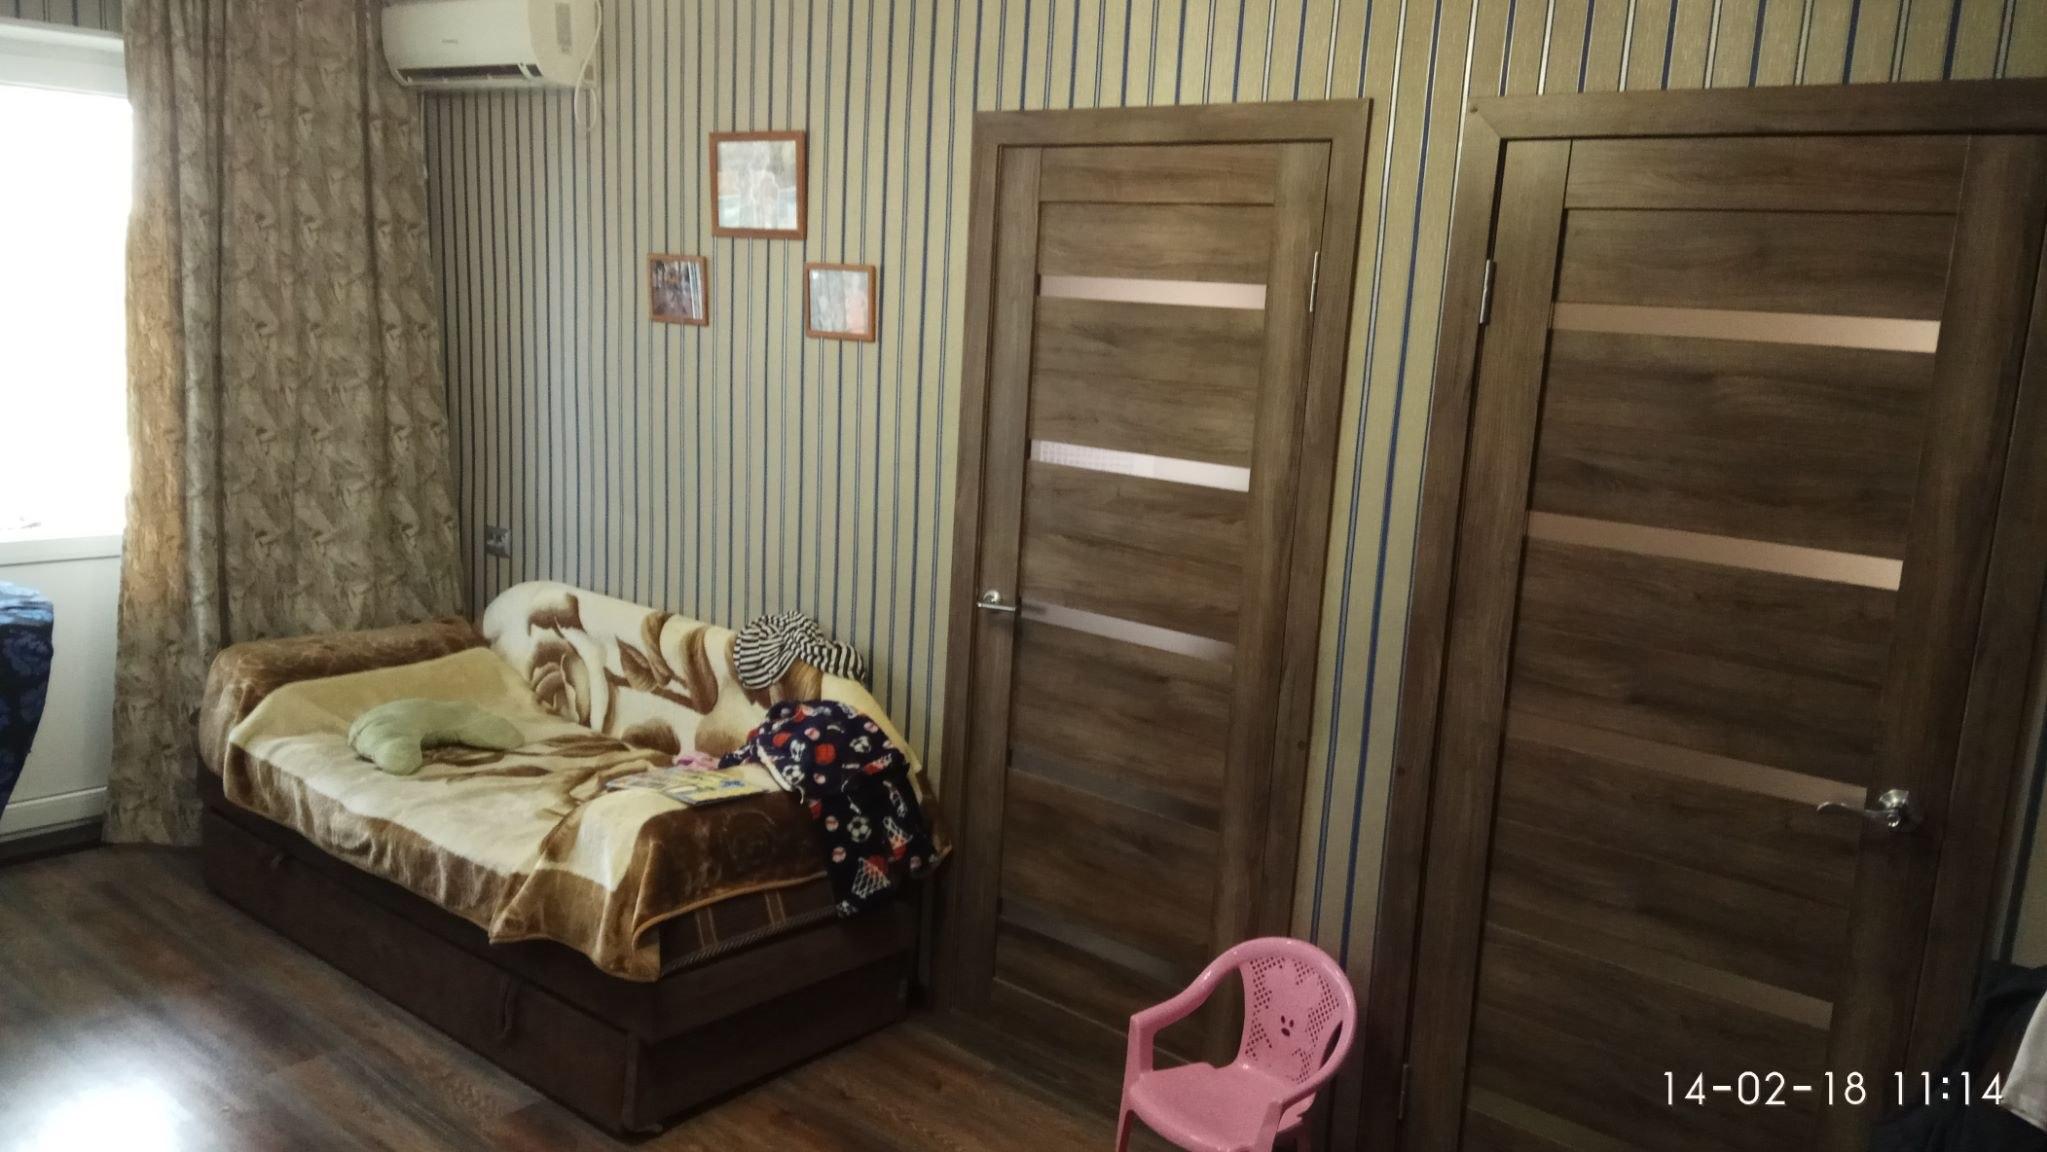 Продажа квартир: 3-комнатная квартира, республика Крым, Сакский р-н, с. Вересаево, Гвардейская ул., фото 1